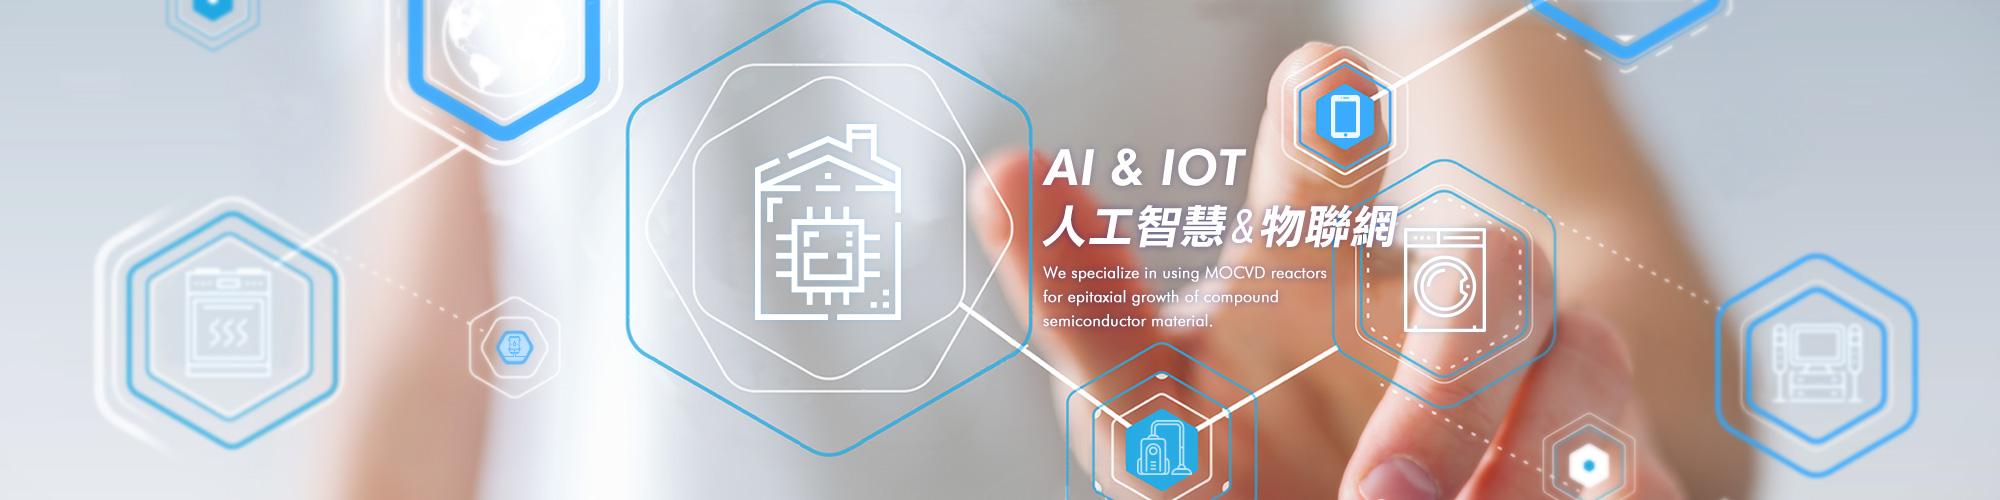 AI & IoT 人工智慧&物聯網